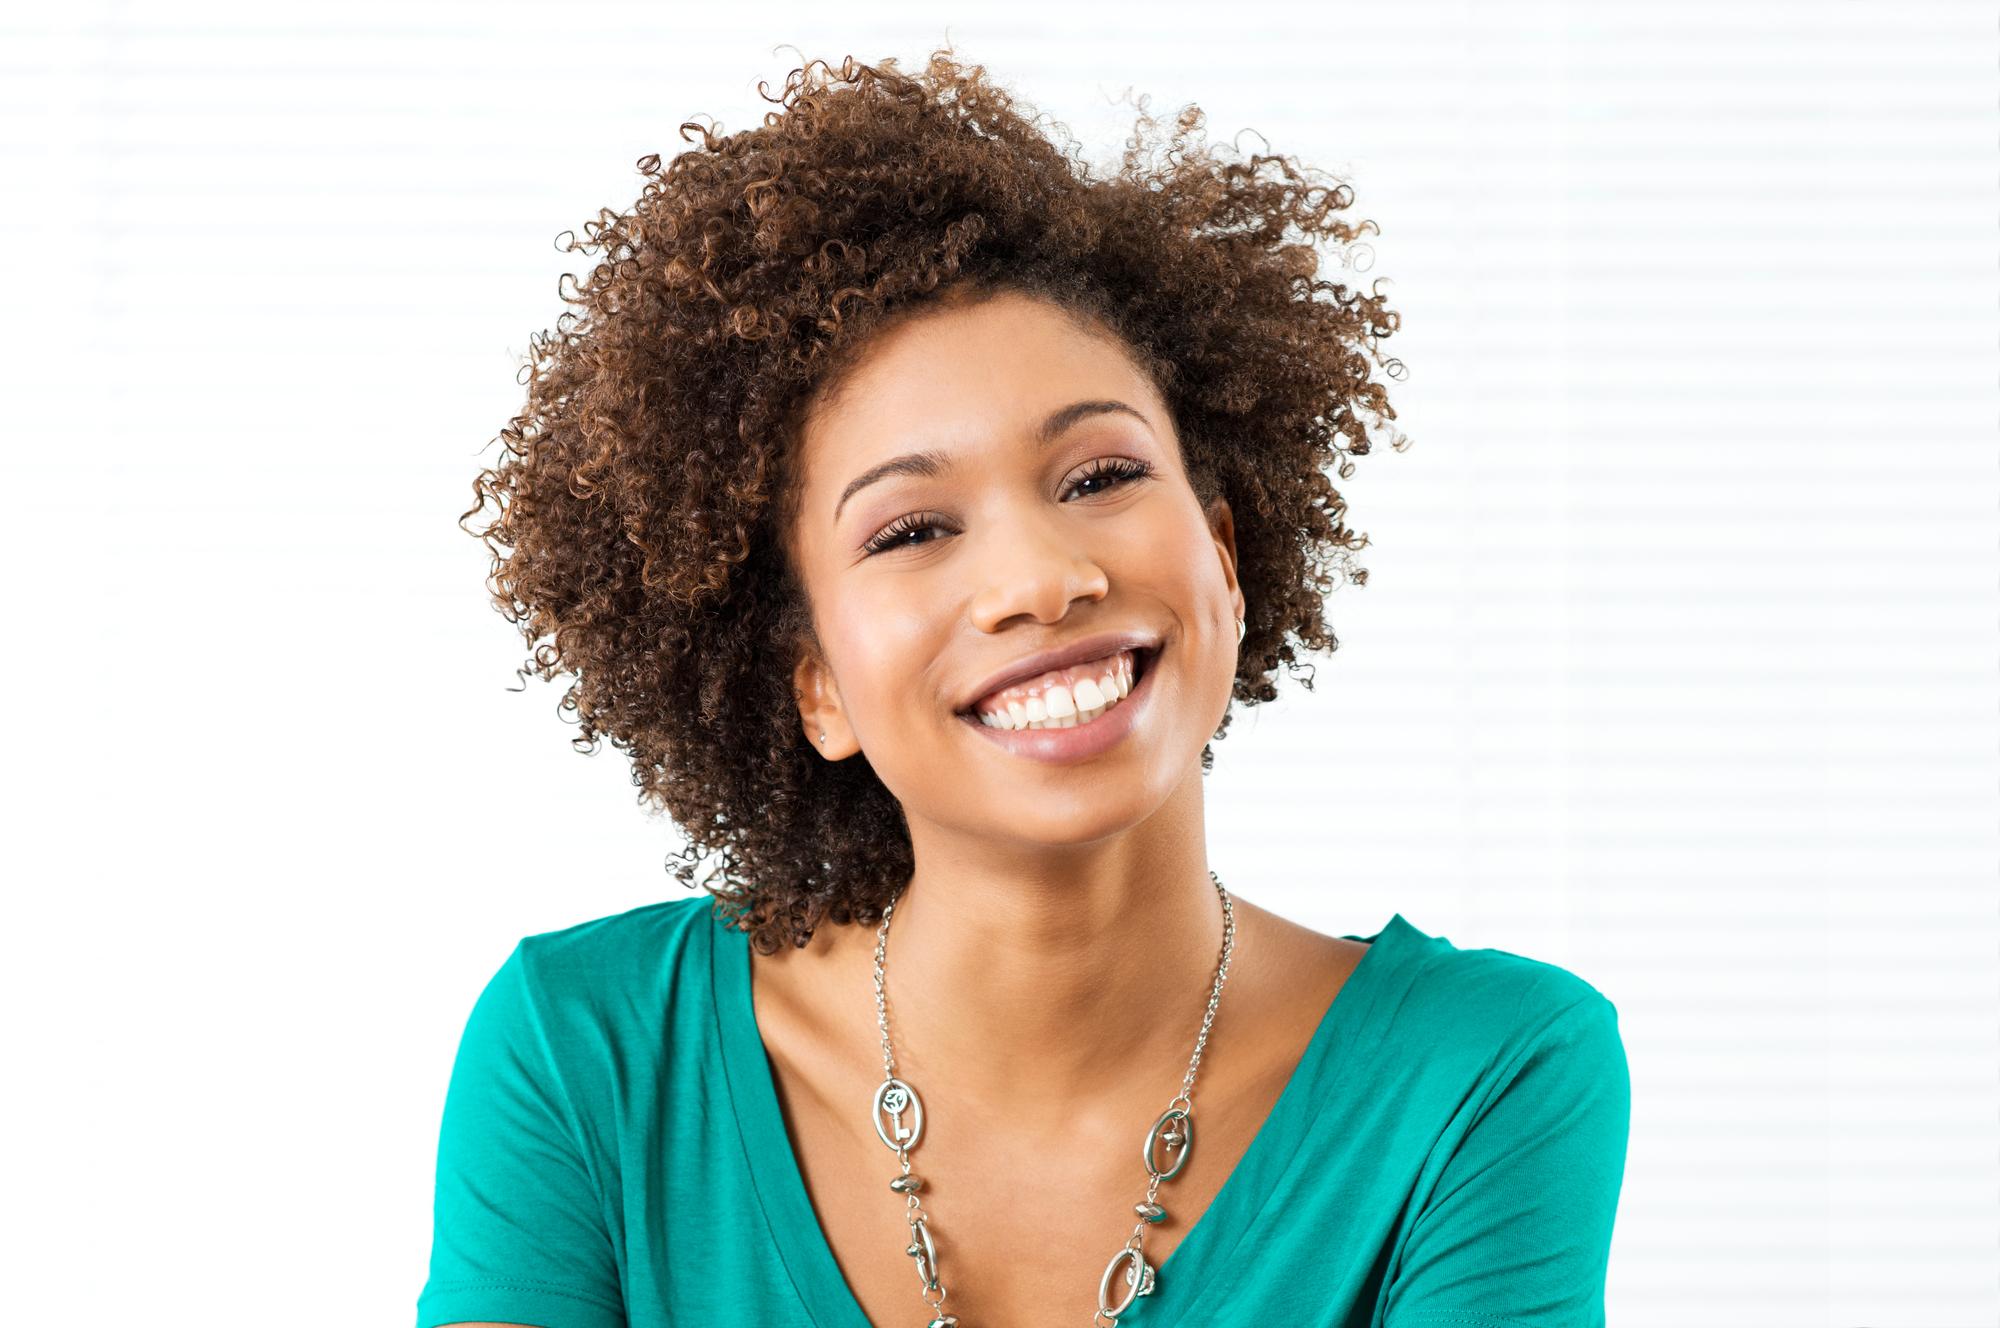 Zoom Teeth Whitening: How It Works